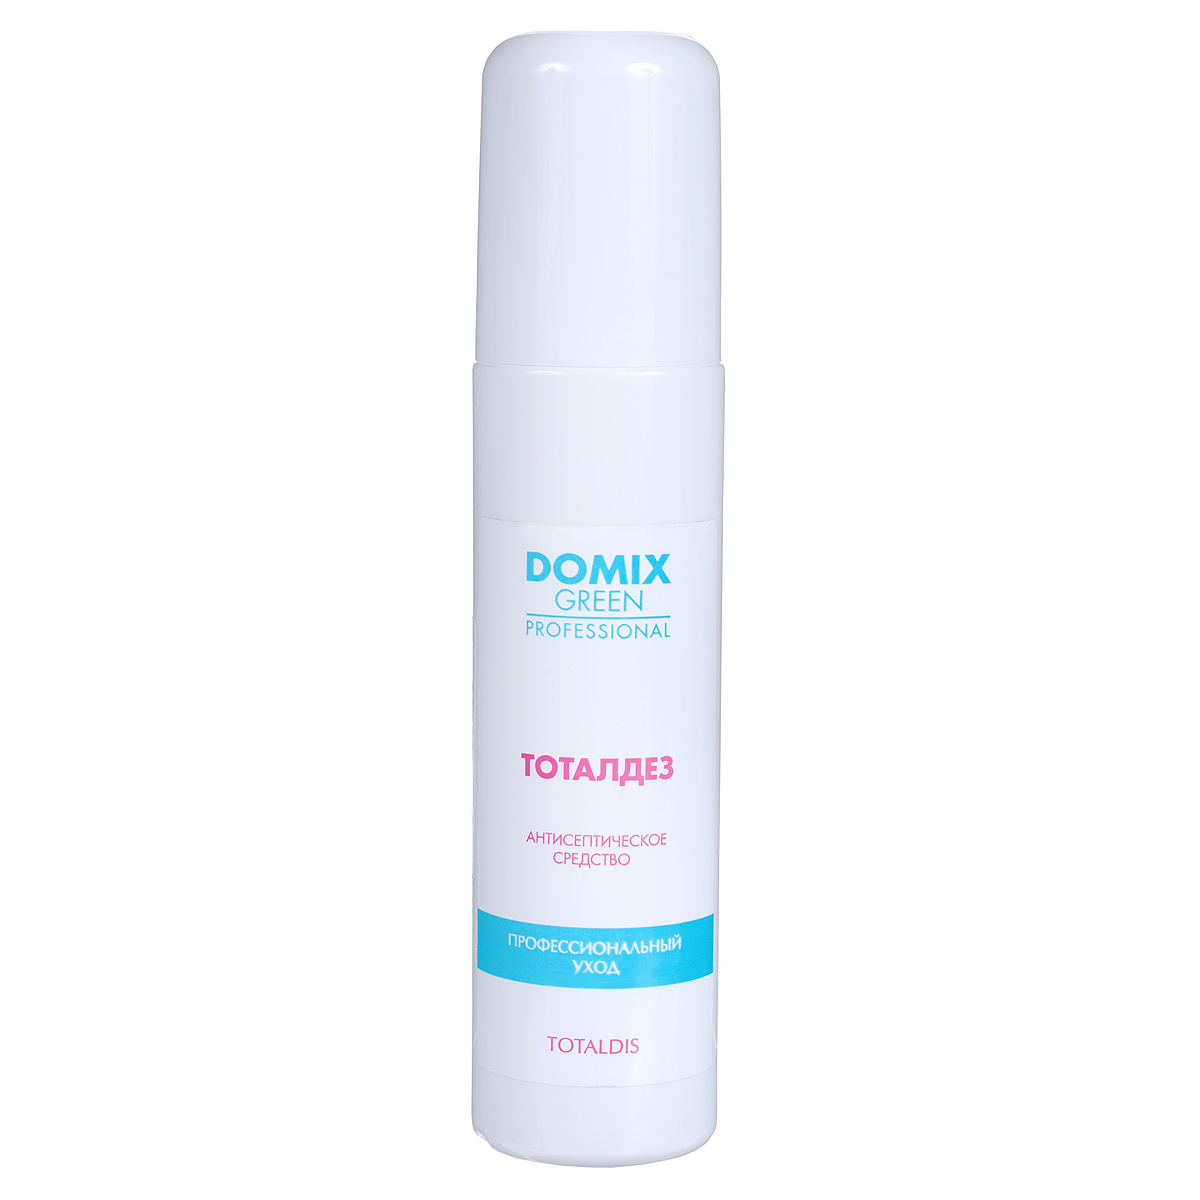 Domix Green Professional Антисептическое средство Totaldis для обработки рук и ступней ног, 150 мл жидкость domix green professional universal neutralizer 150 мл